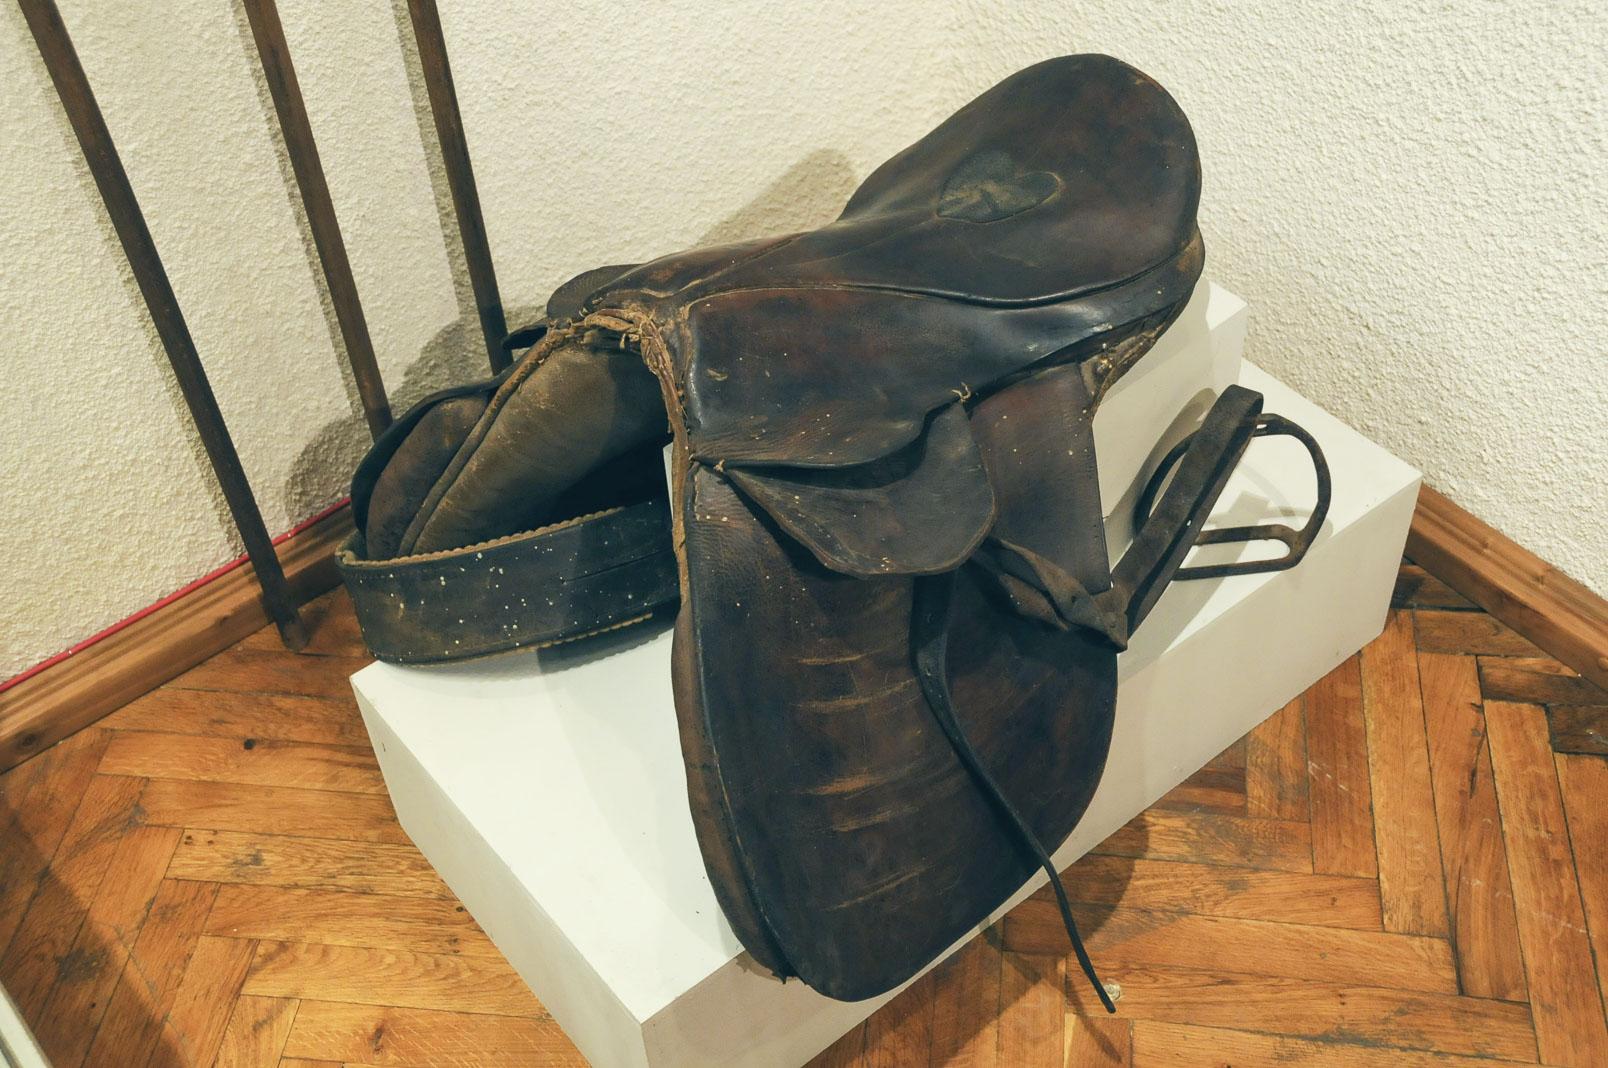 troyan-museum-jivotat-na-edna-idea-25